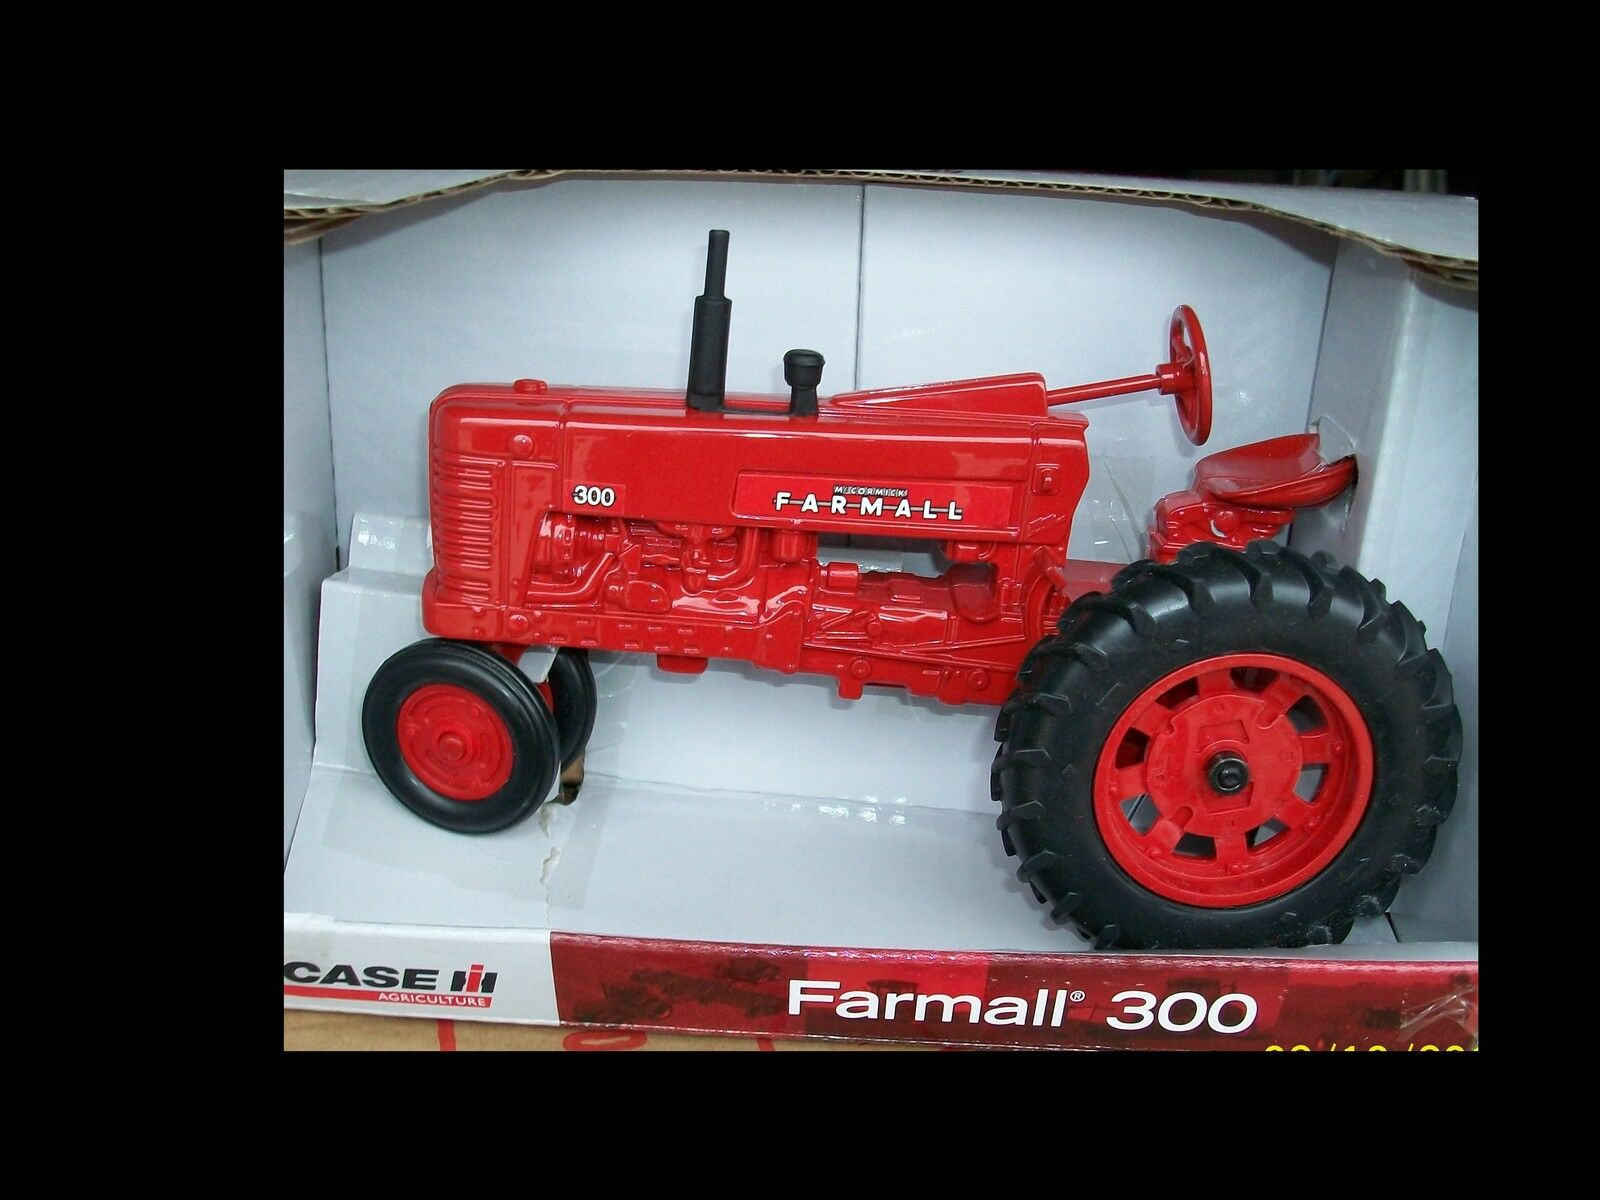 Farmall 300 tractor 1 16 Ertl 14813